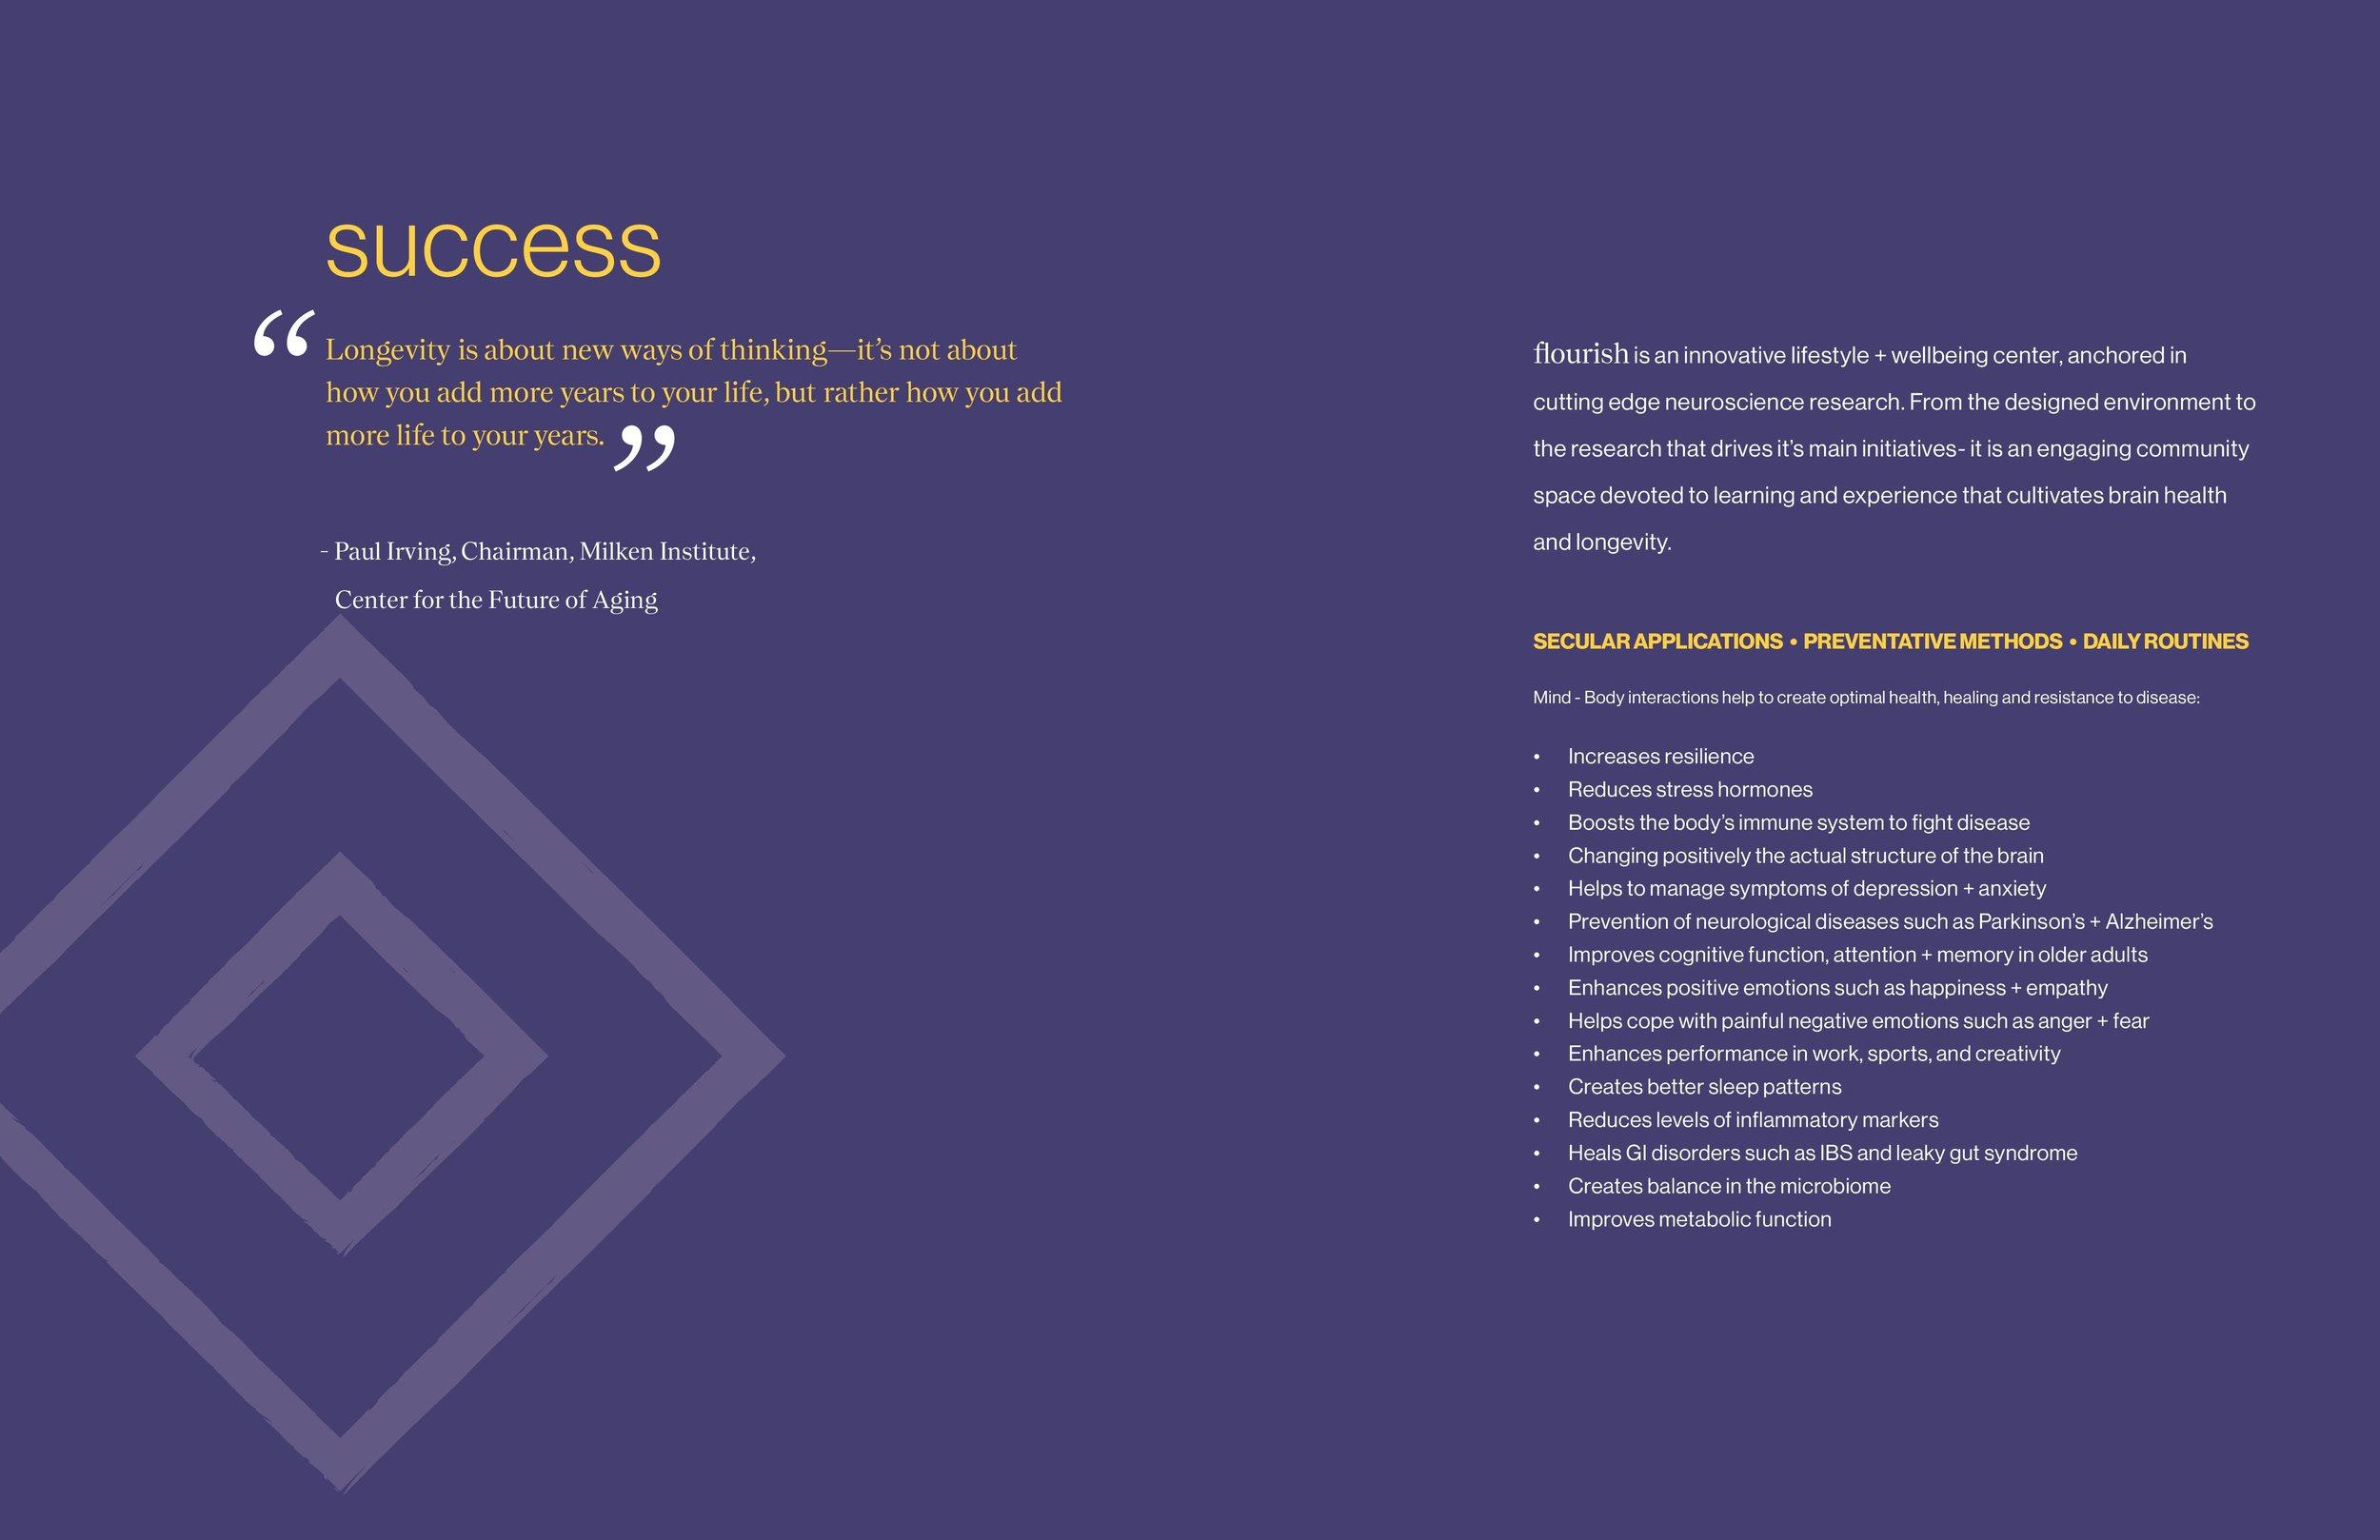 Flourish17-Brochure-1b-page-015.jpg